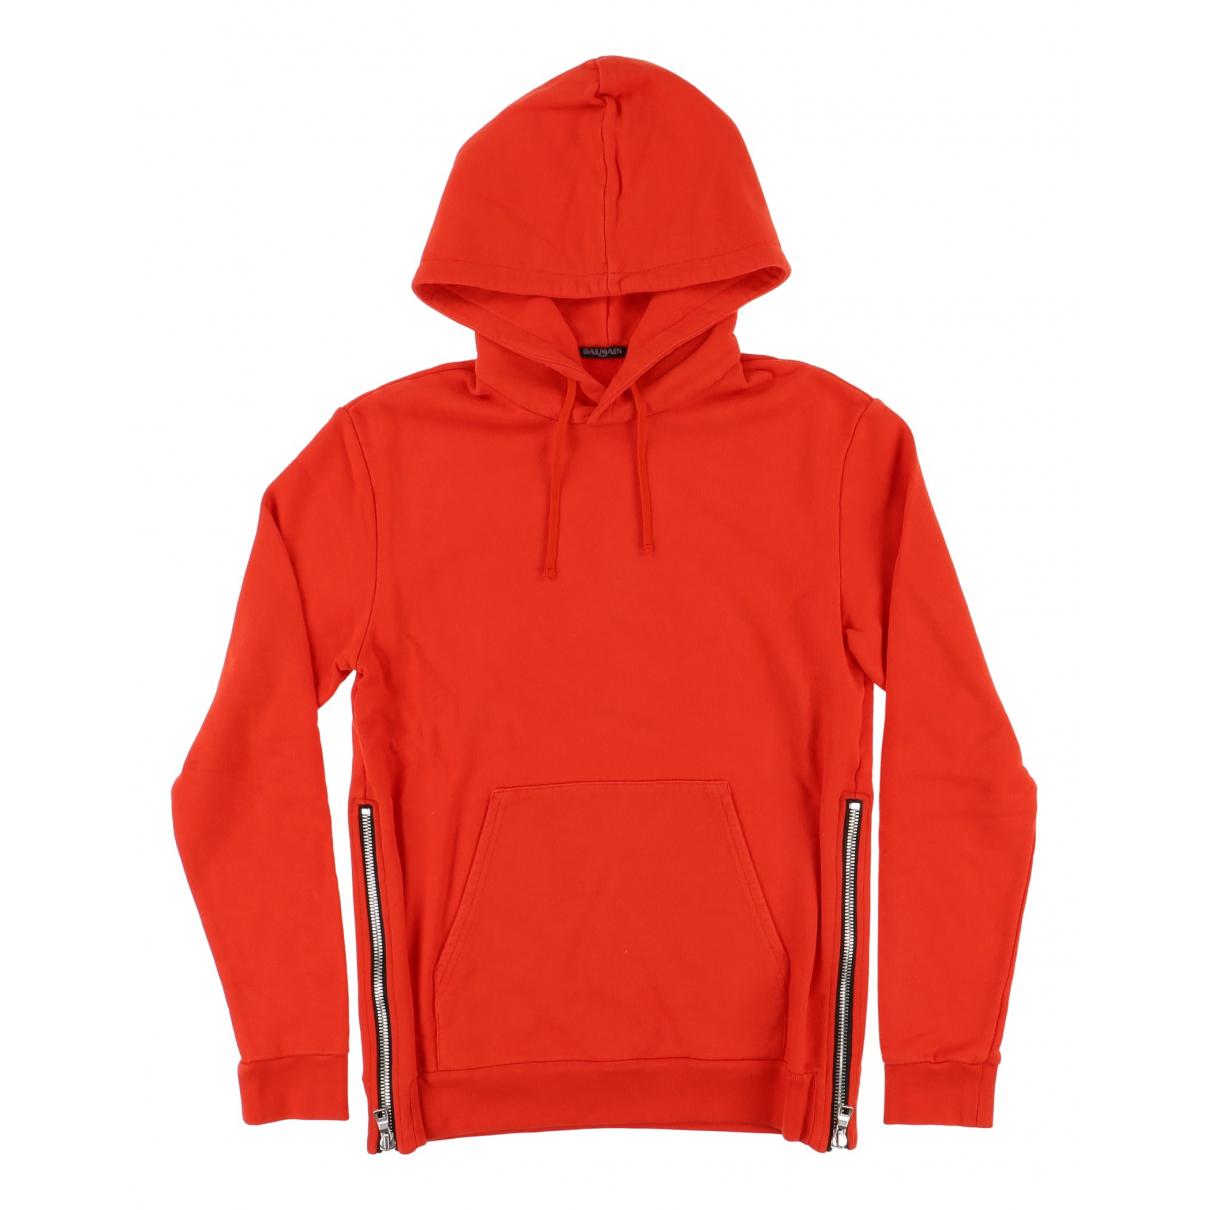 Balmain \N Red Cotton Knitwear & Sweatshirts for Men S International